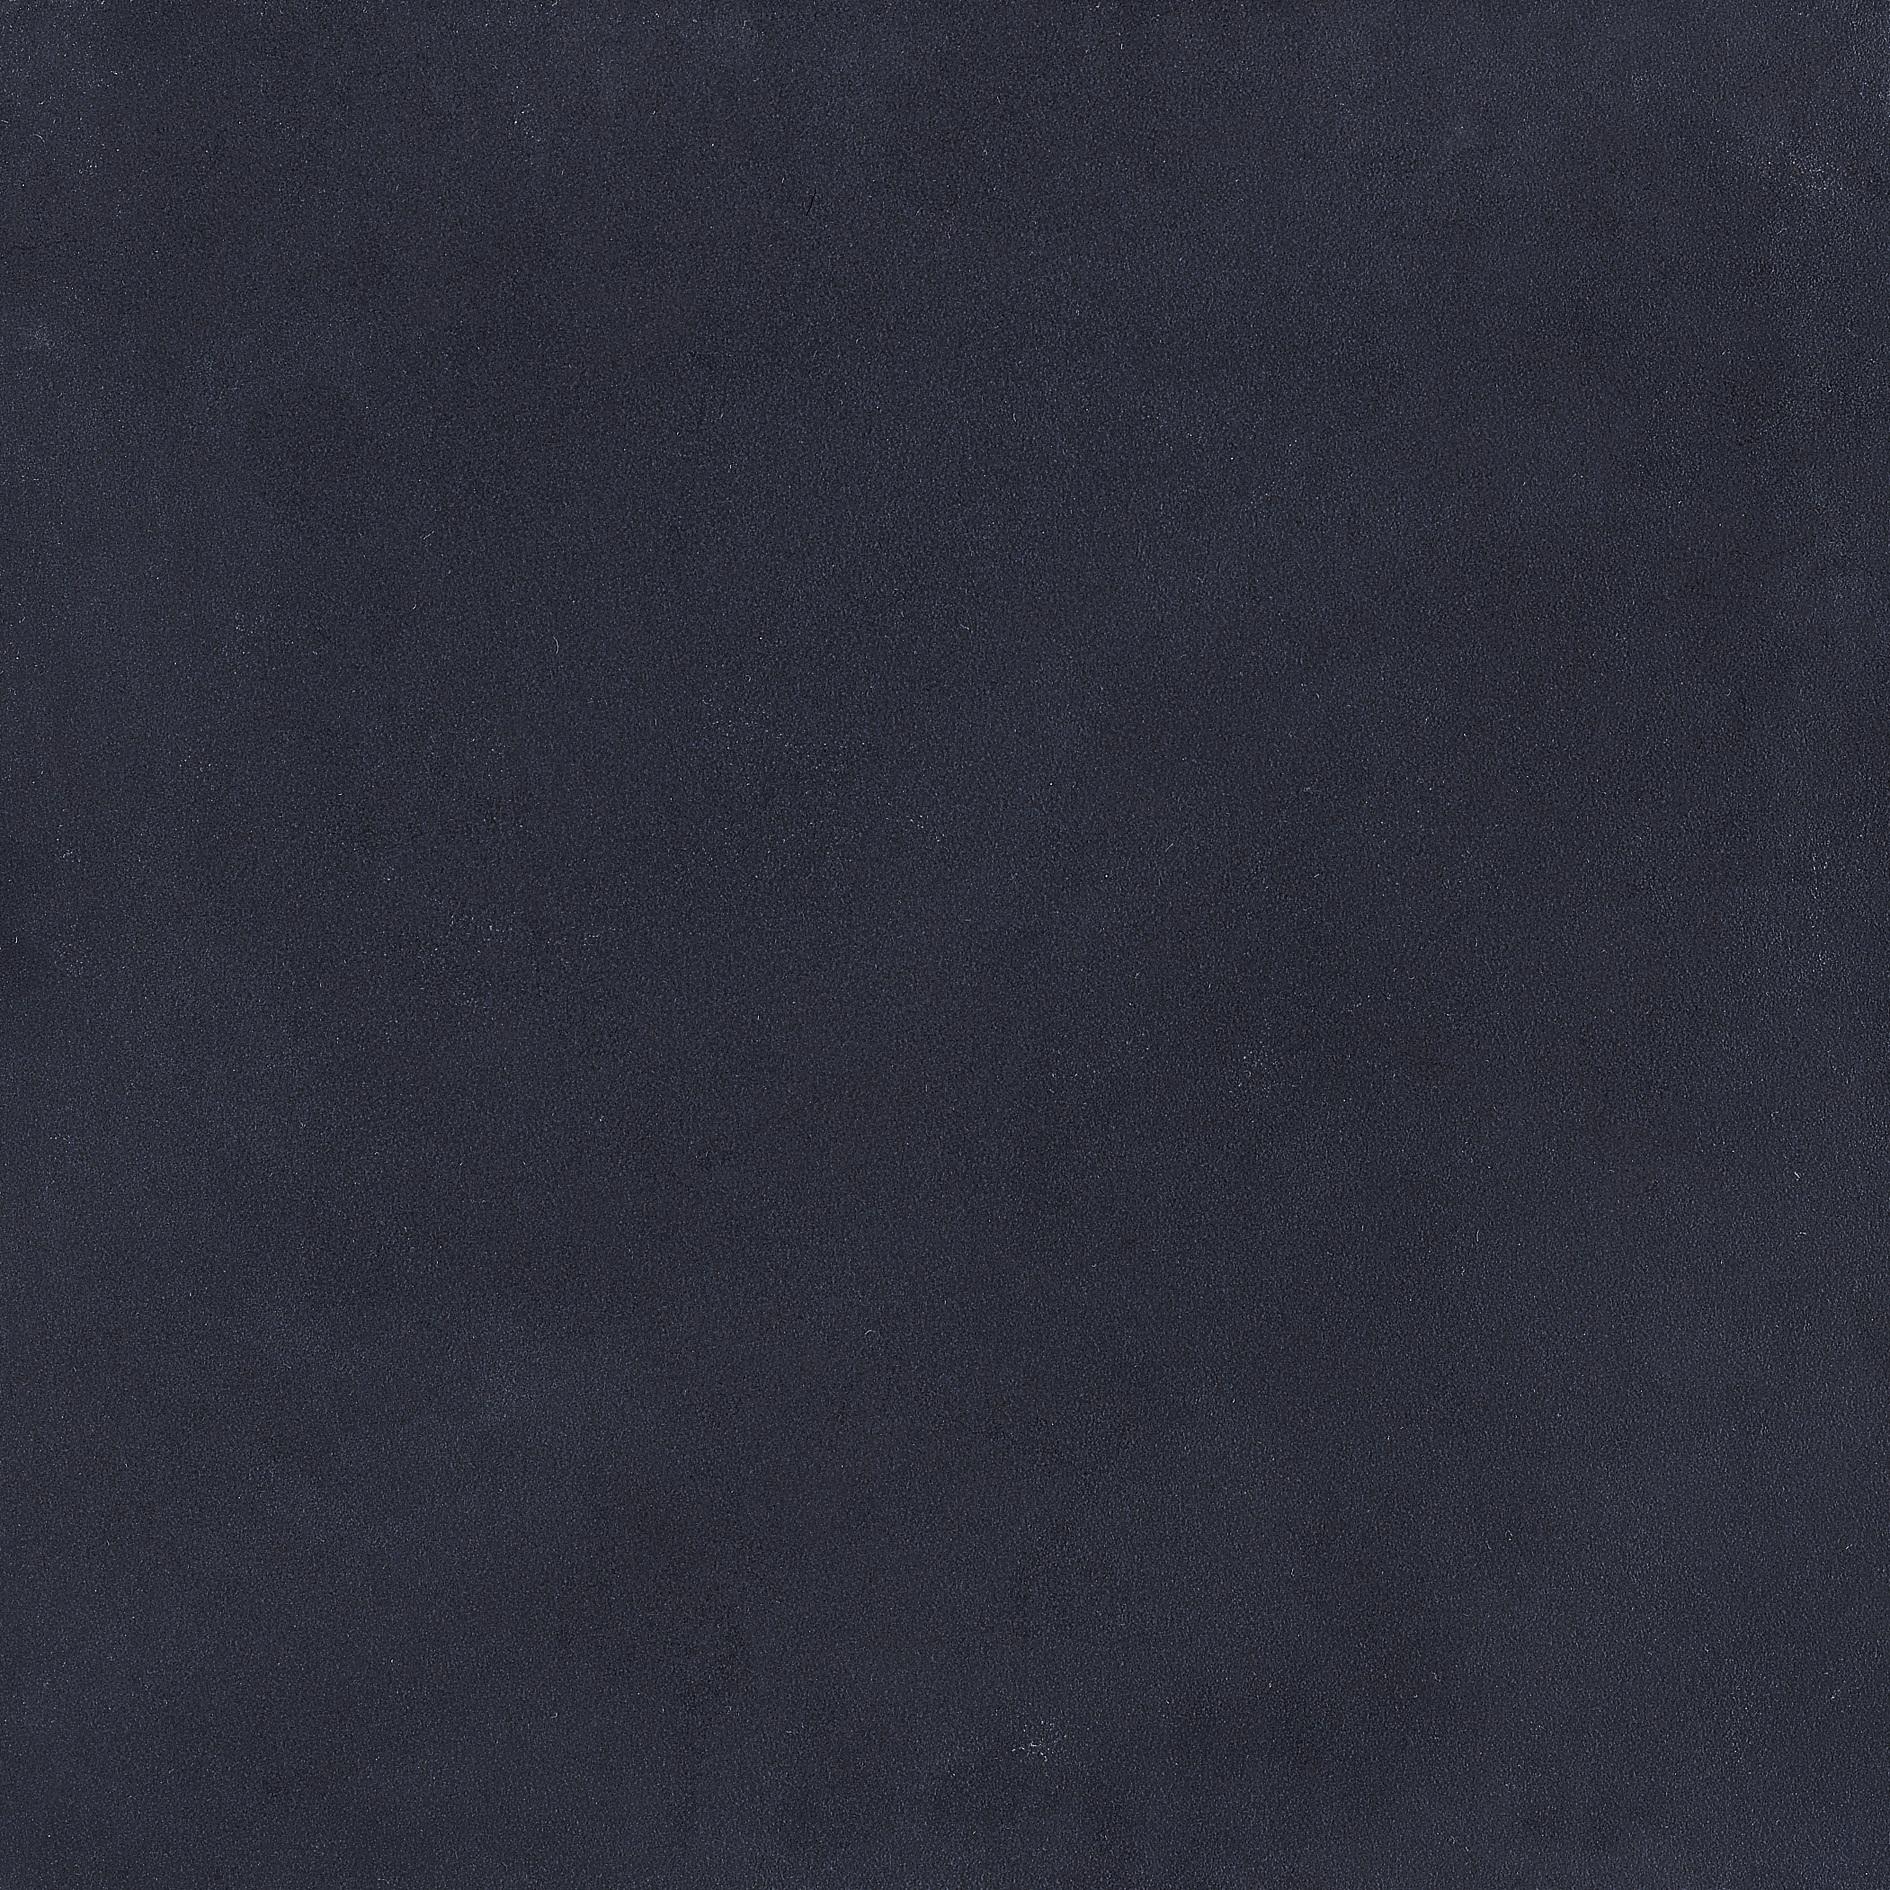 Gạch nhám - mờ - METRO STEEL45